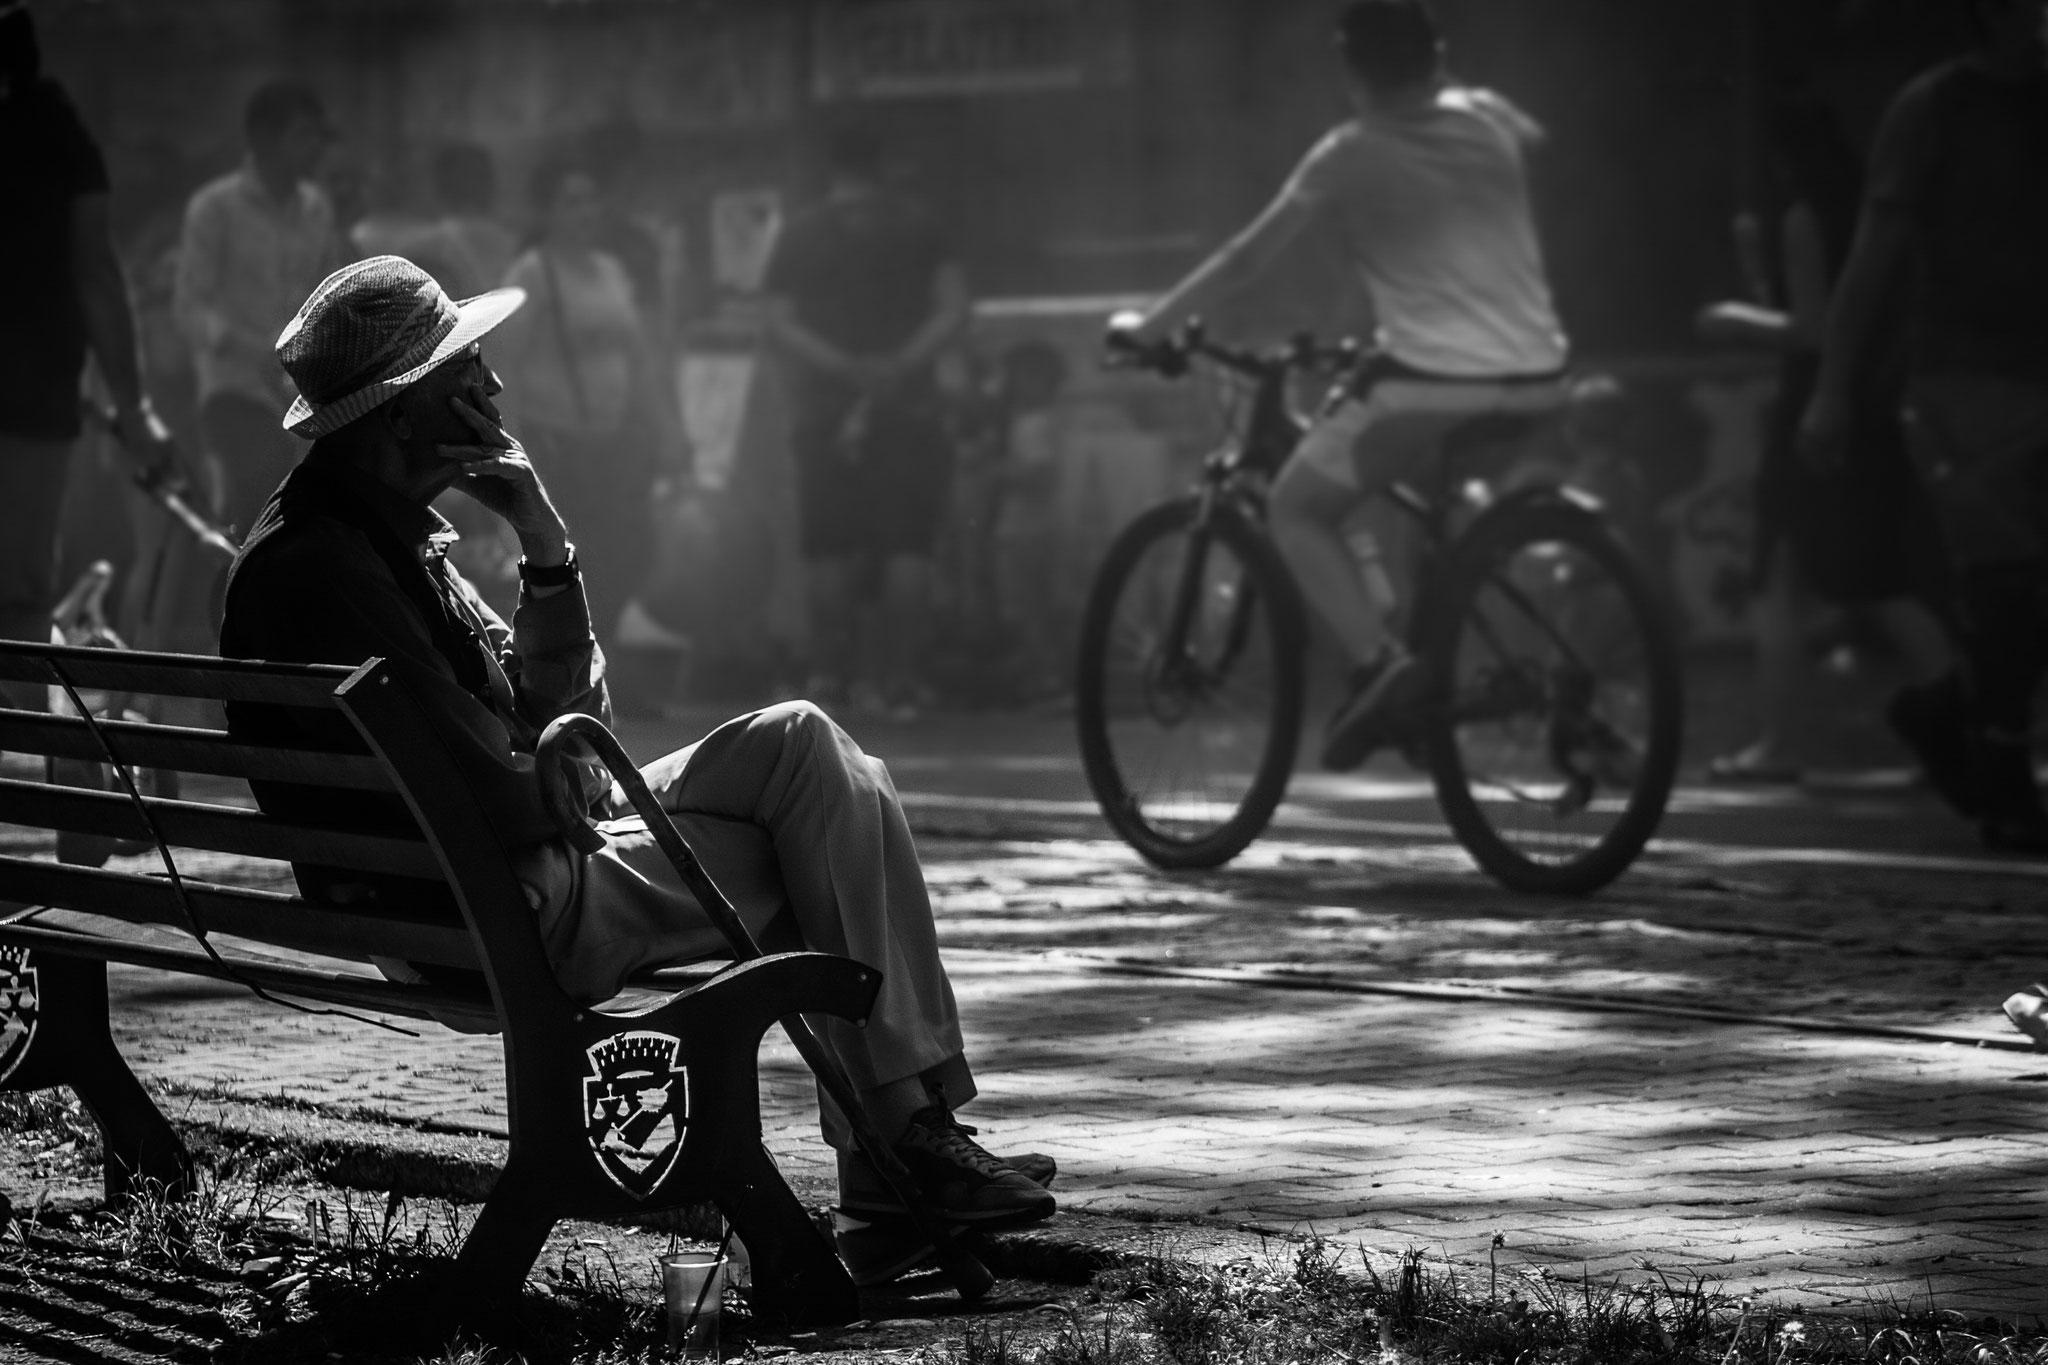 Lakó Anna (Romania) - Walk Square